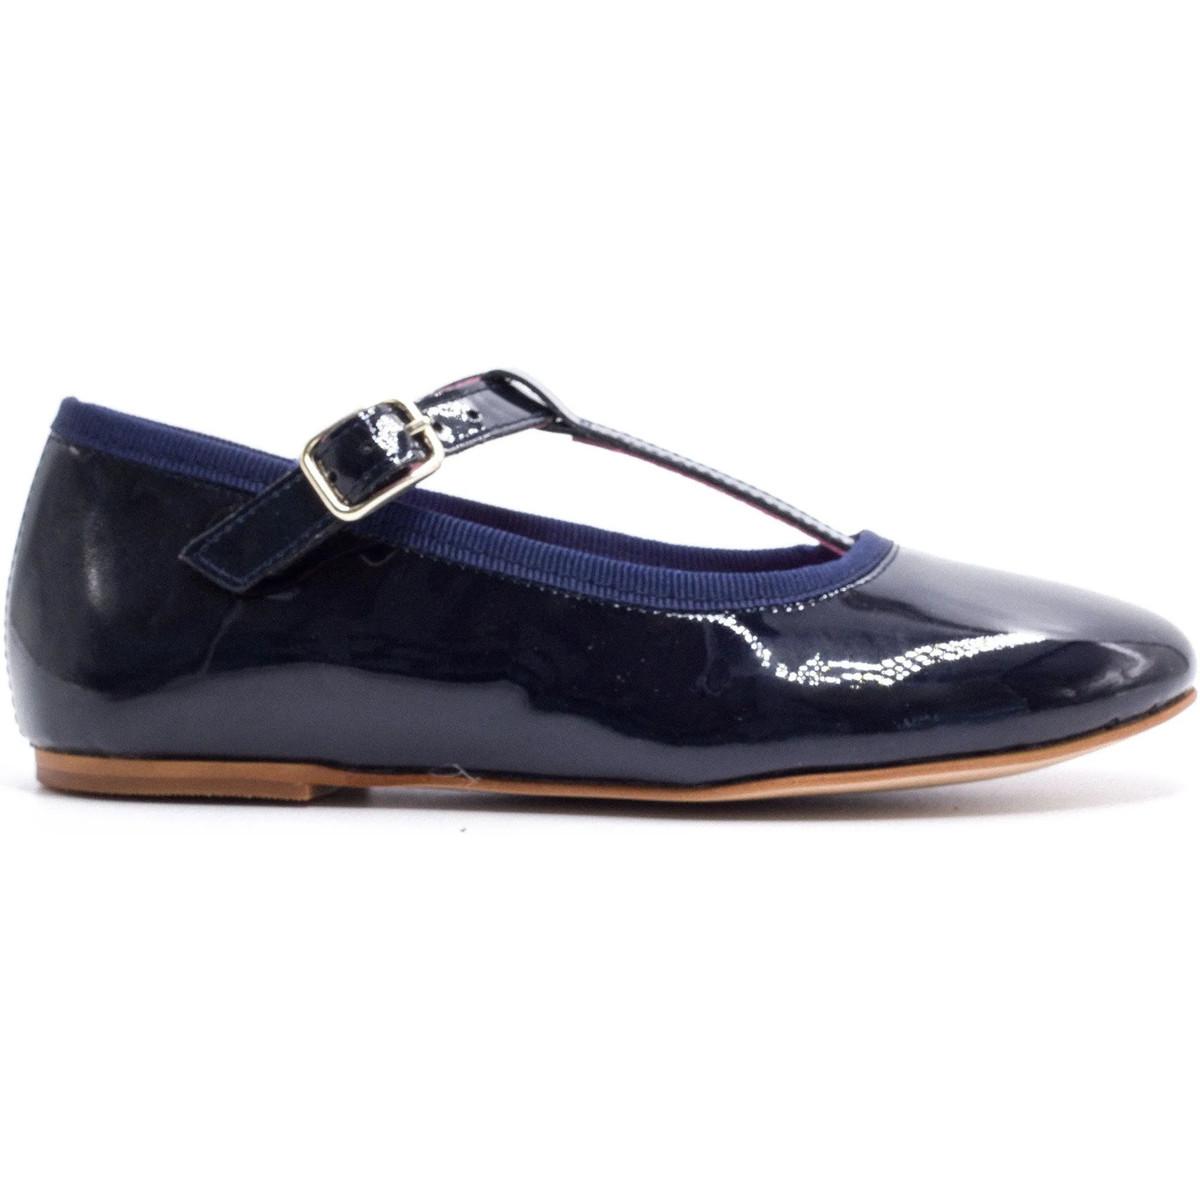 Ballerines Boni Classic Shoes Boni Aurore - ballerine fille Bleu Marine